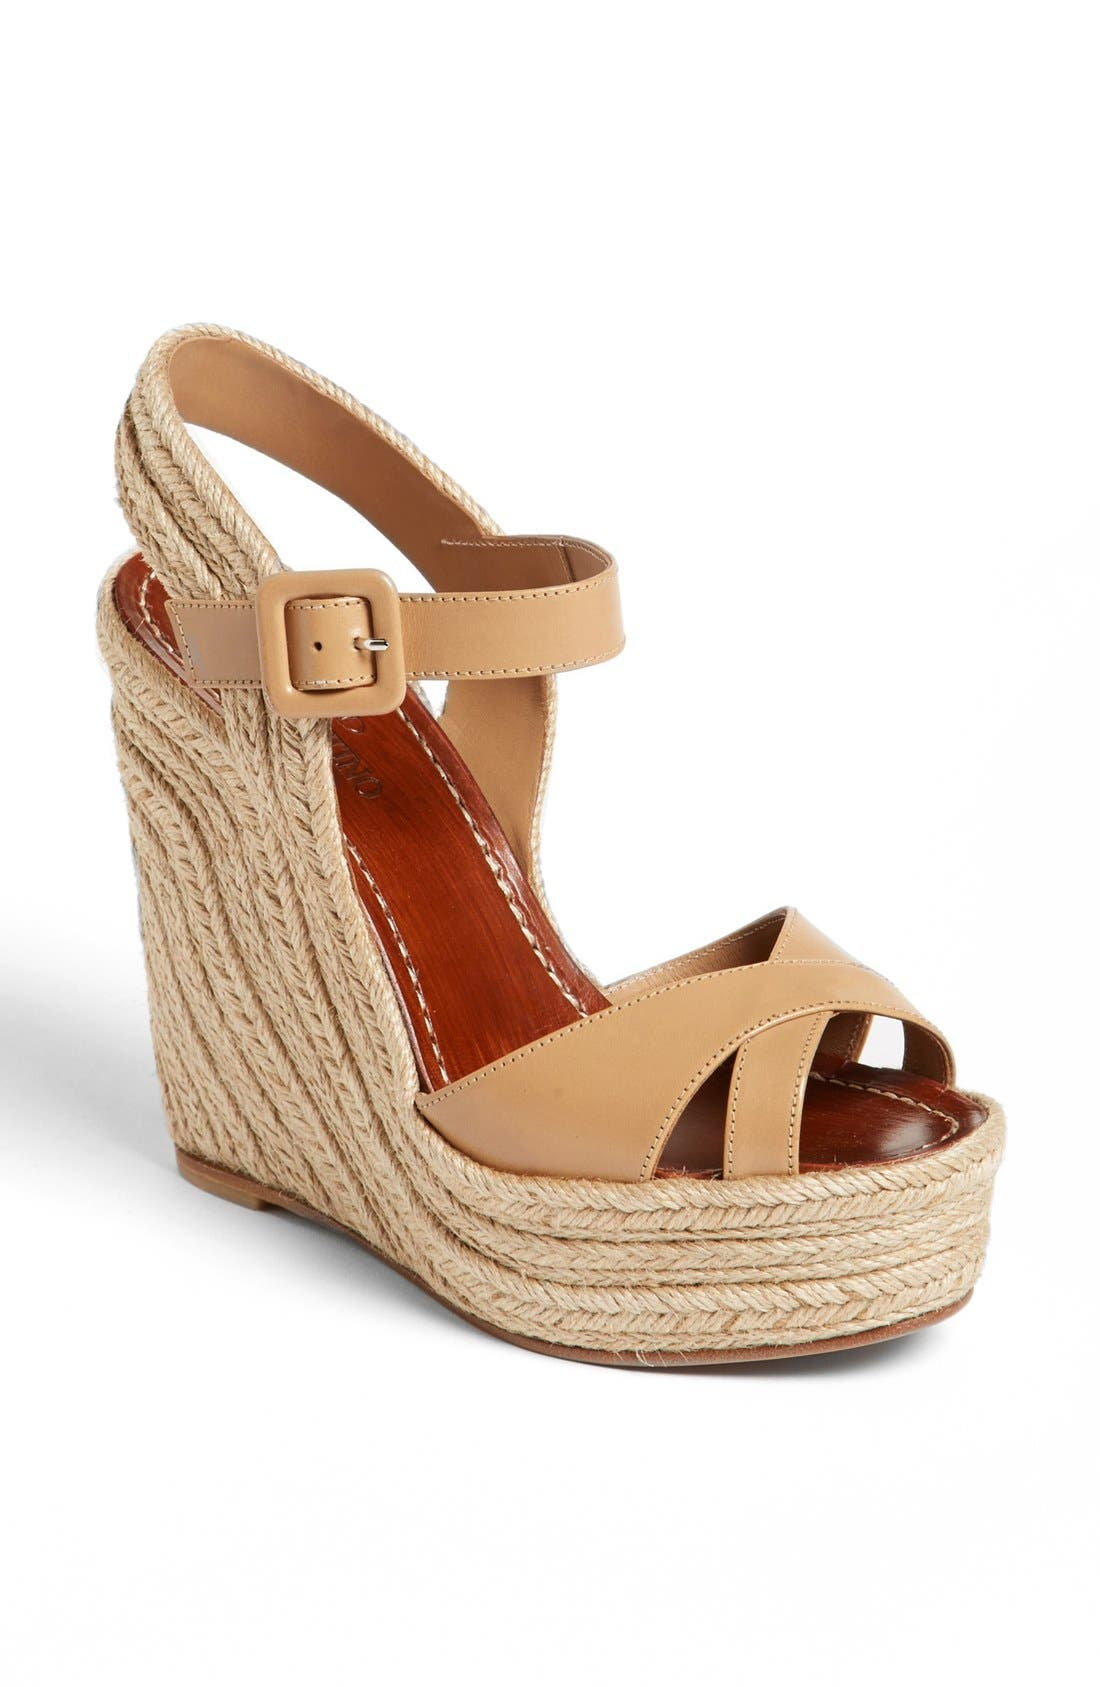 Alternate Image 1 Selected - Valentino 'St. Tropez' Espadrille Wedge Sandal